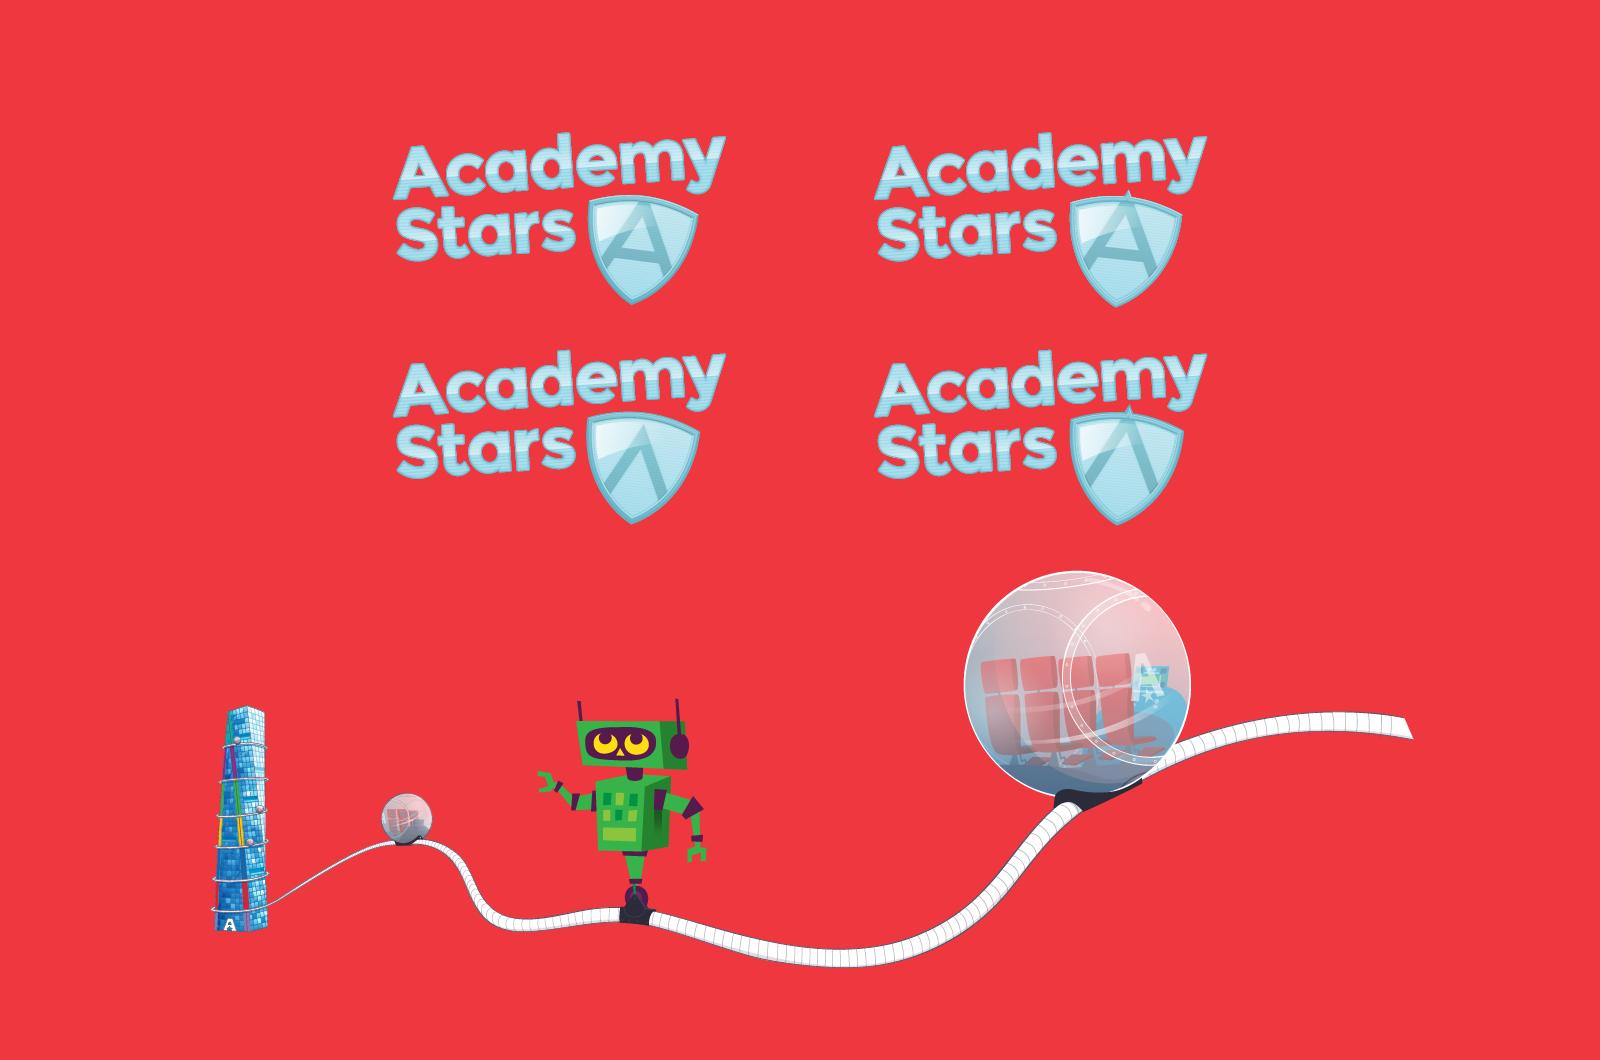 Academy Stars branding